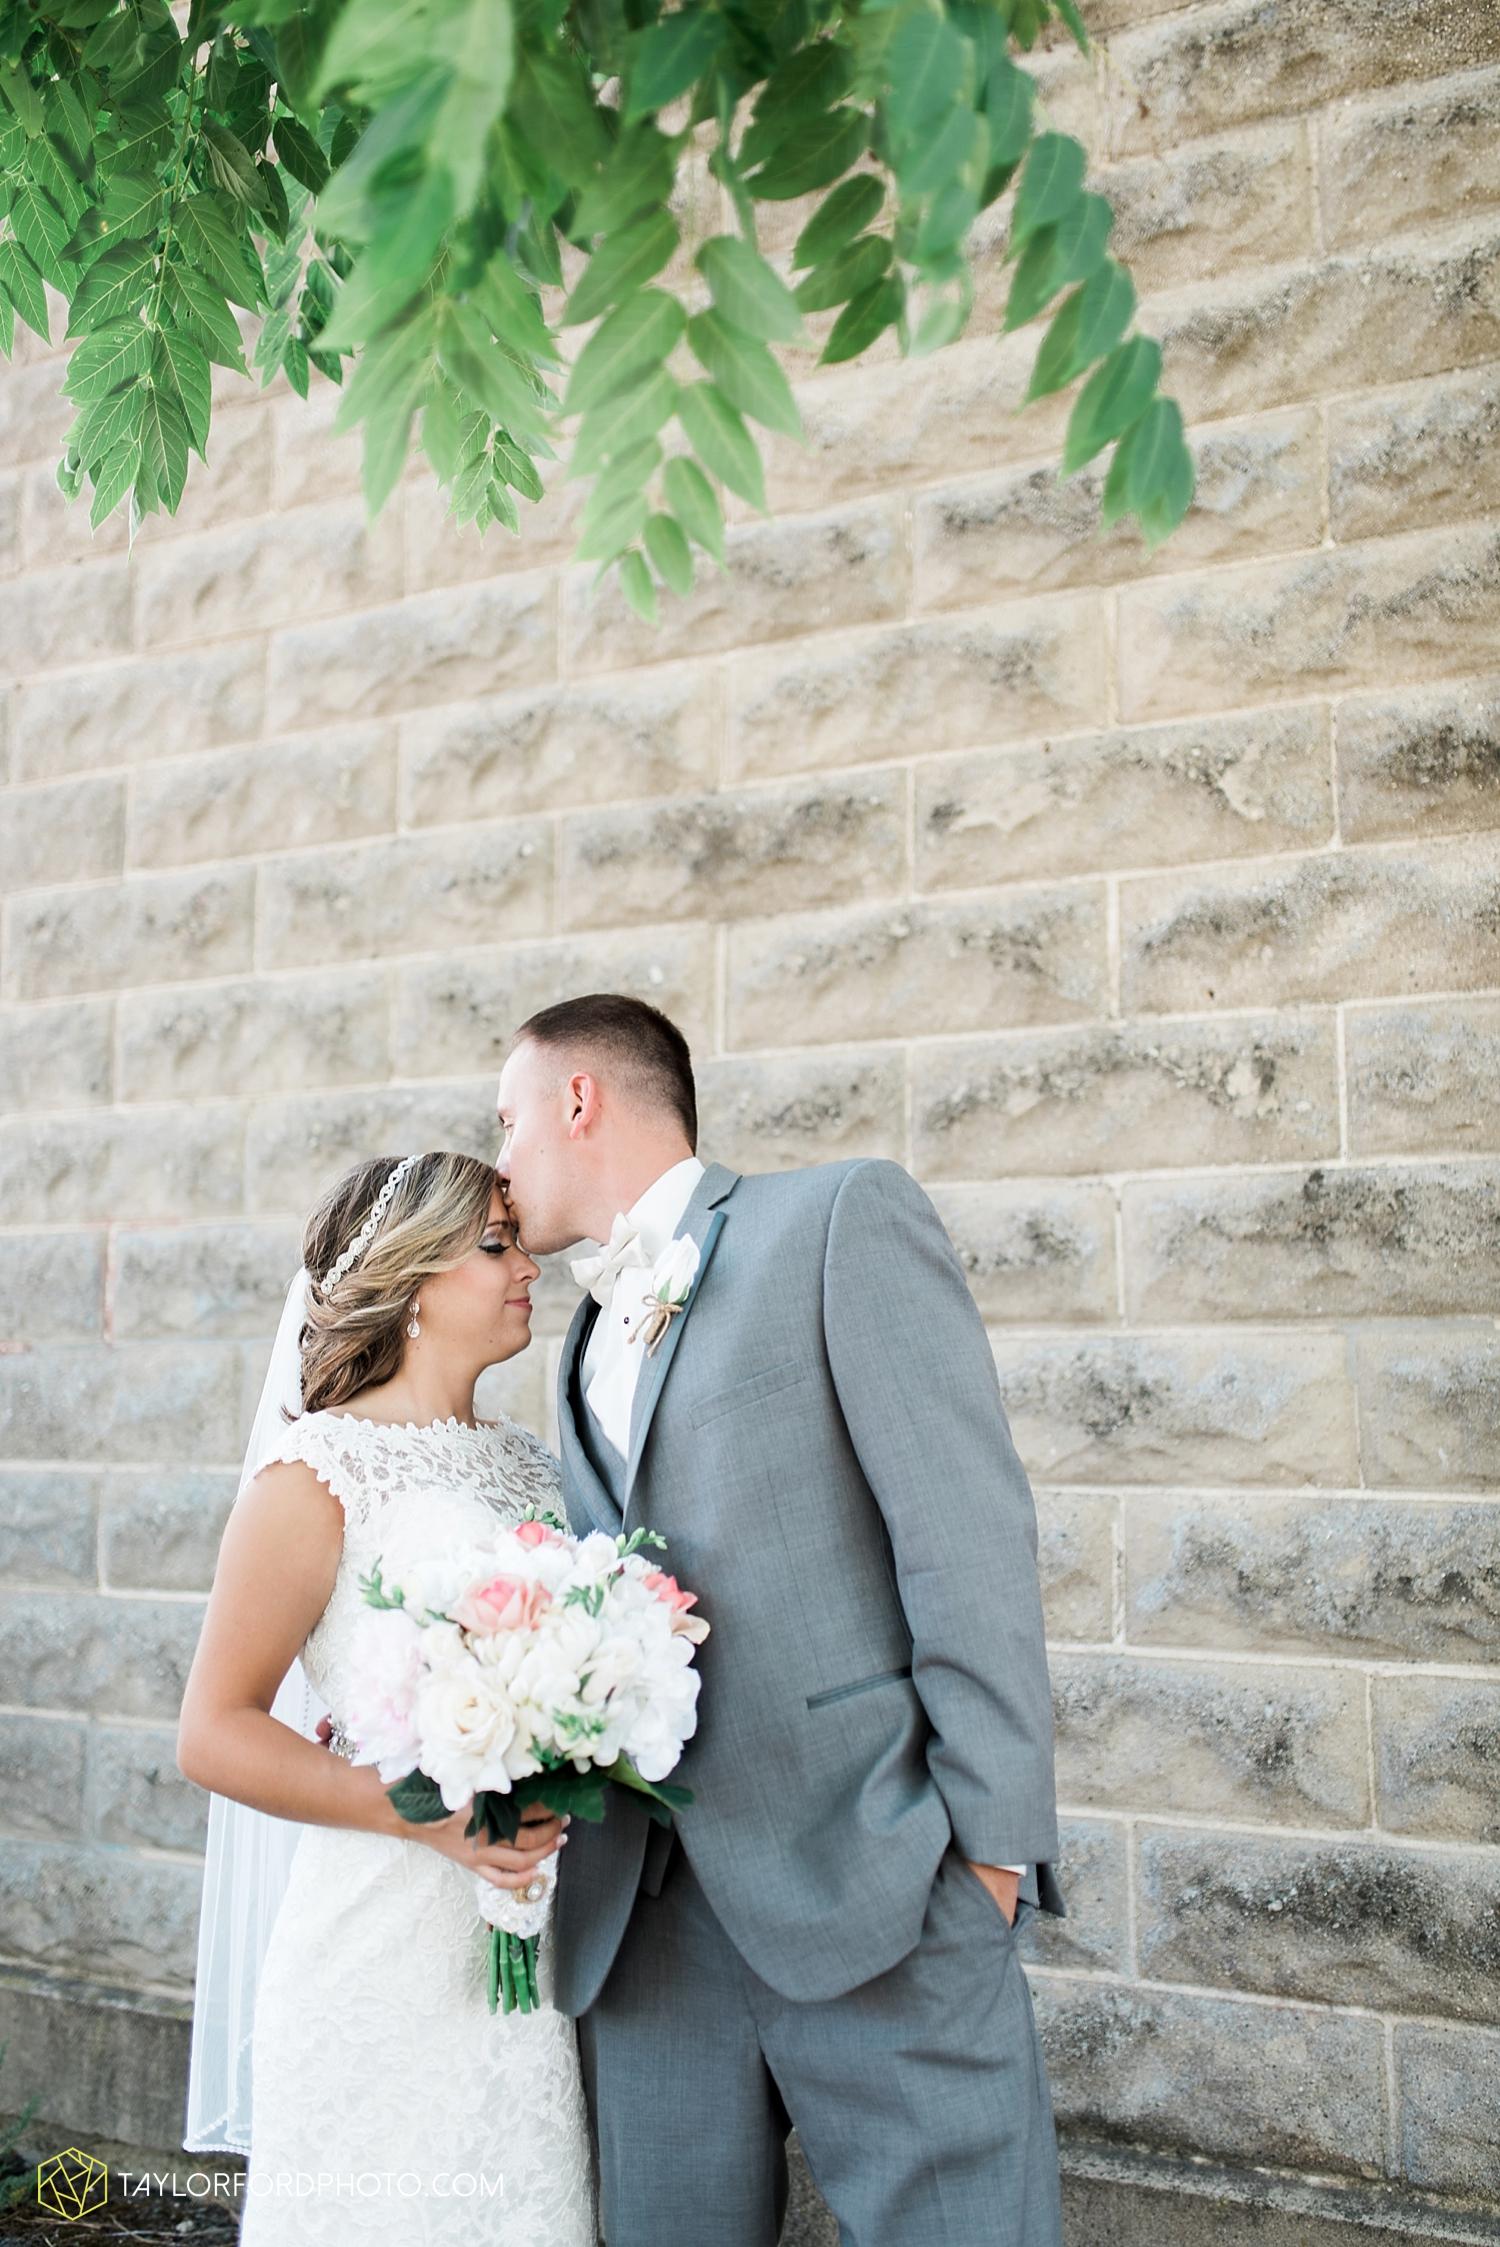 van_wert_wedding_photographer_taylor_ford_ohio_indiana_fort_wayne_2105.jpg